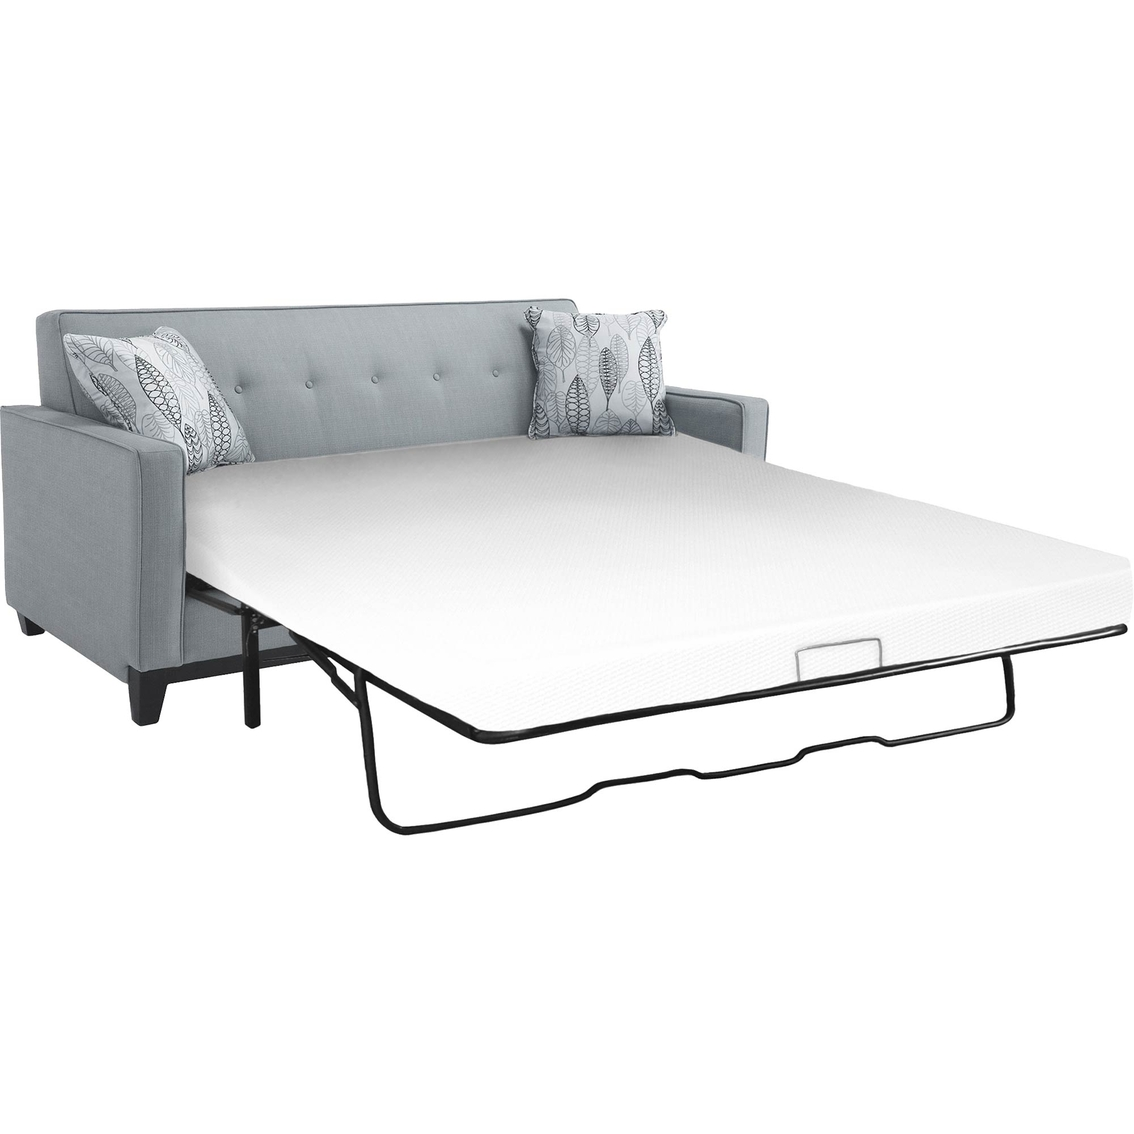 Snuggle Home Memory Foam Twin Sleep Sofa Replacement  : 75312123550 from www.shopmyexchange.com size 1134 x 1134 jpeg 215kB